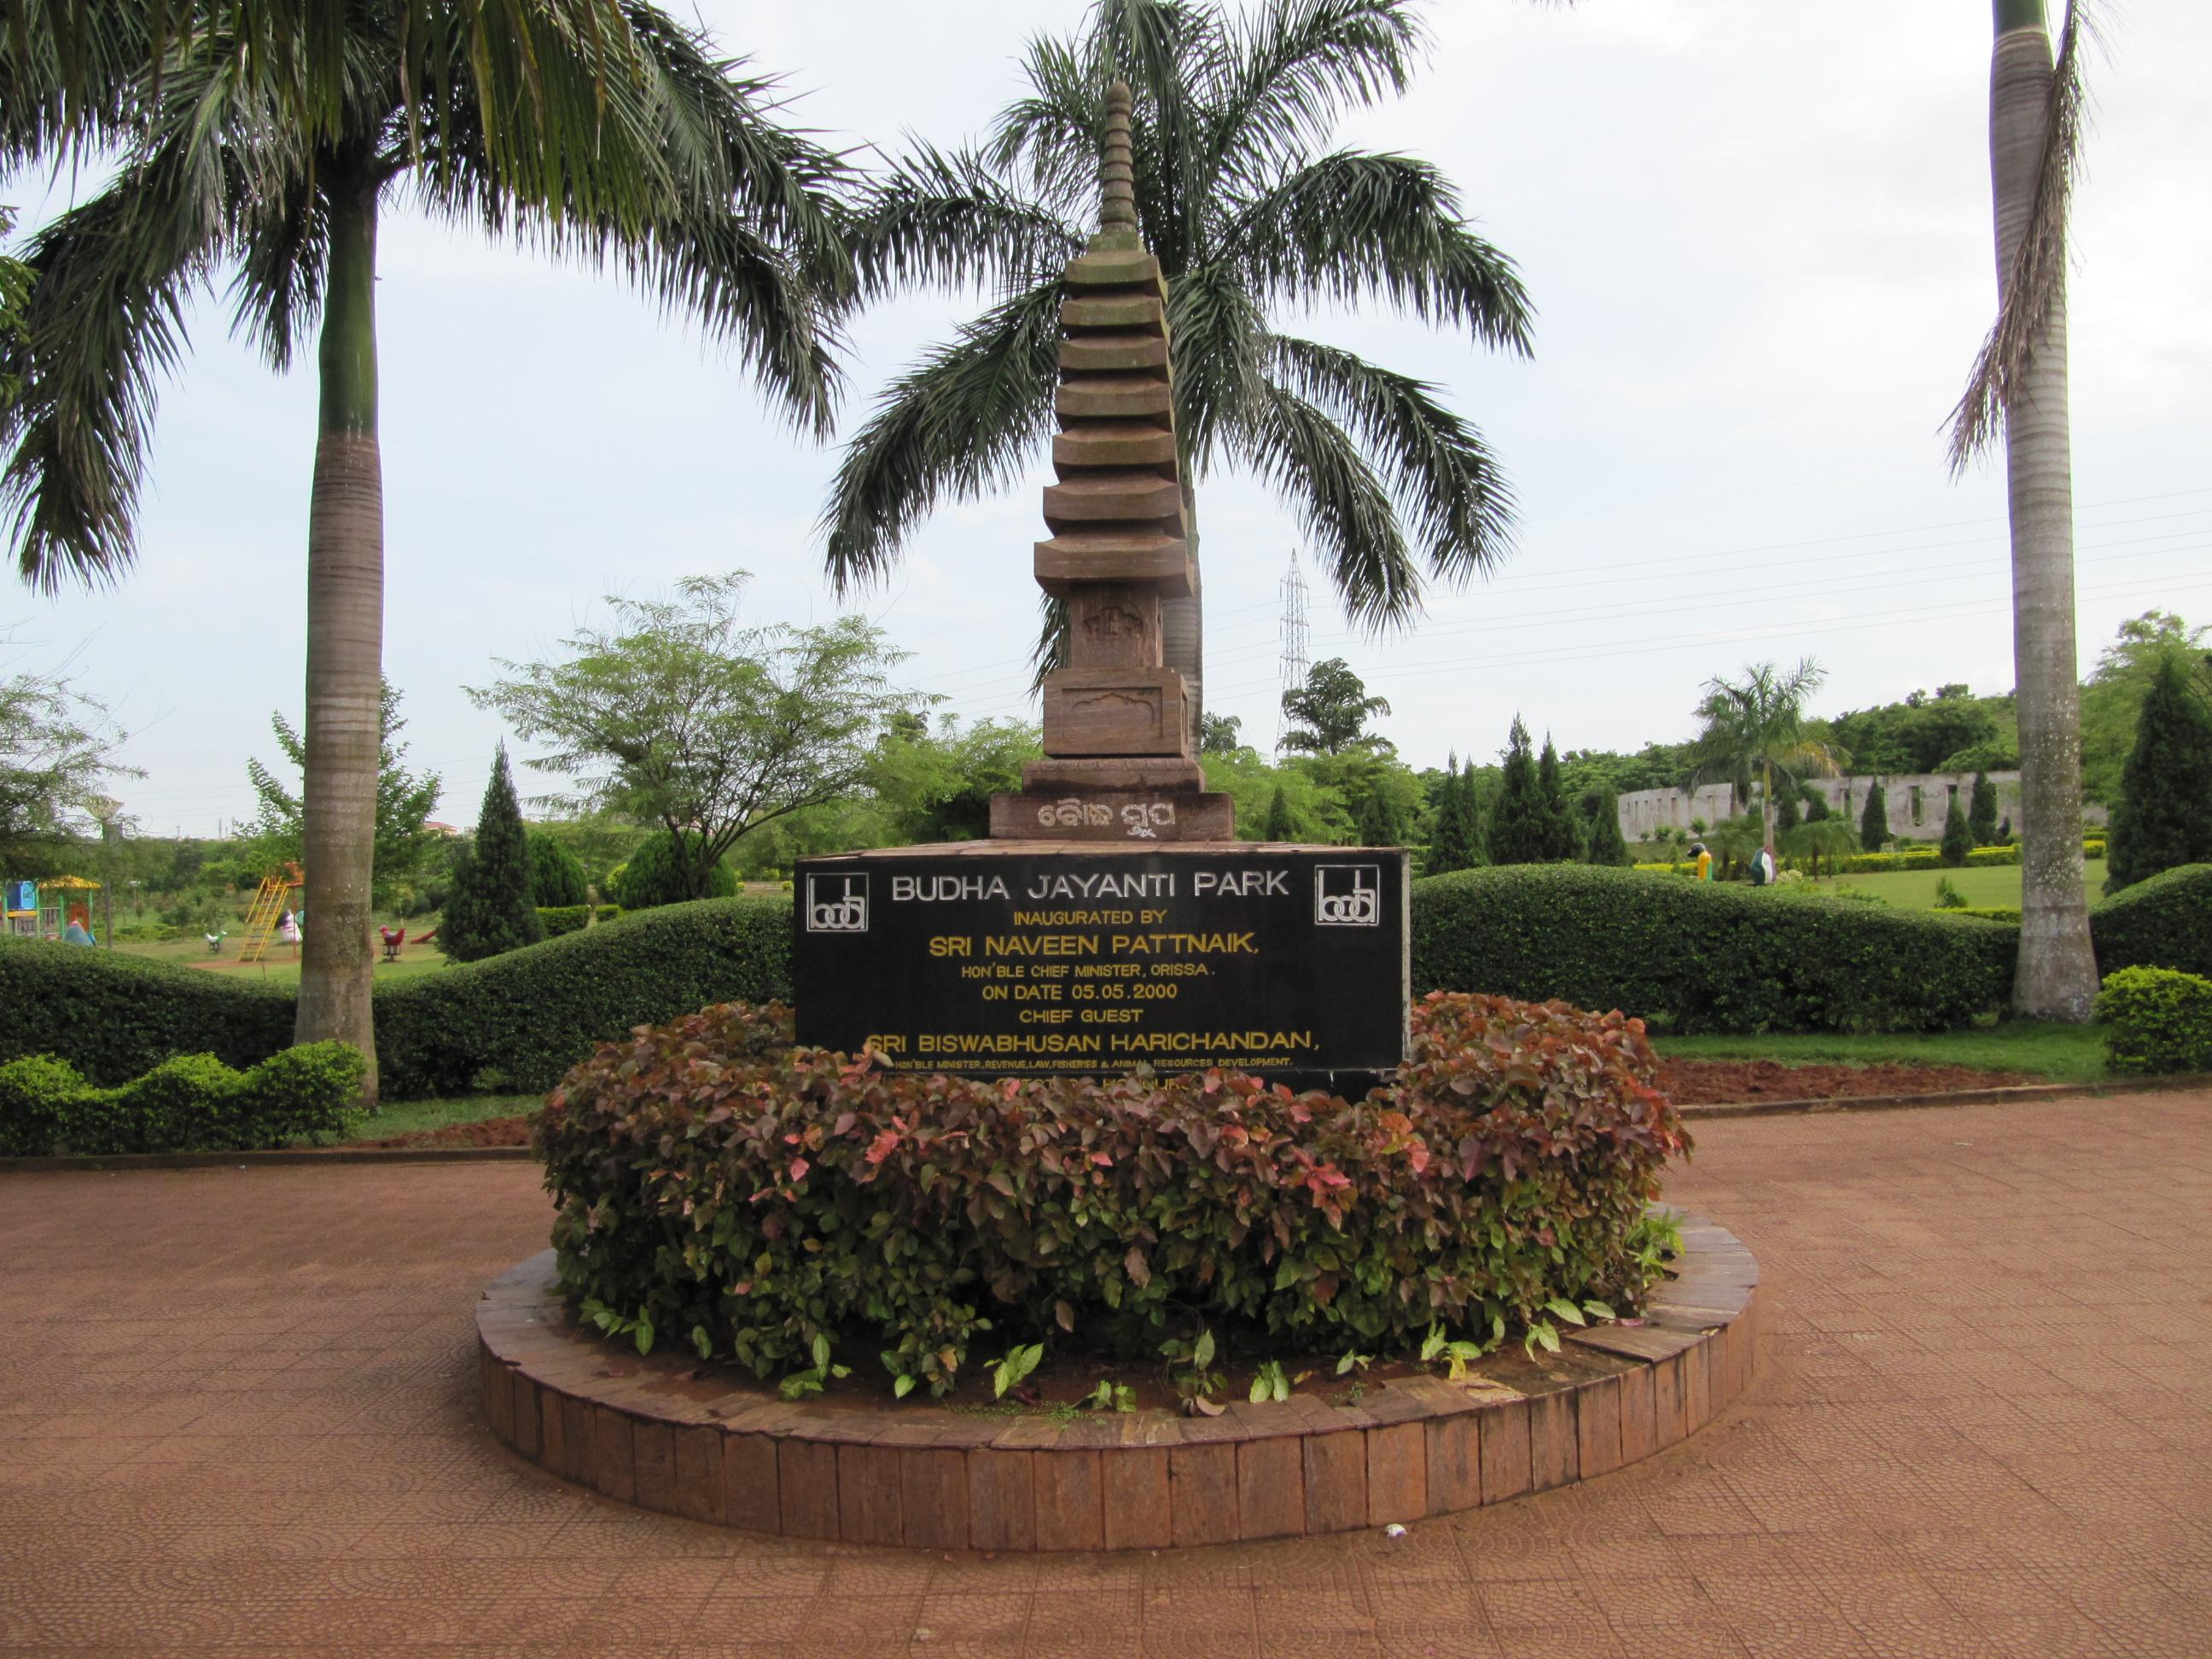 buddha jayanti park bhubaneswar buzz